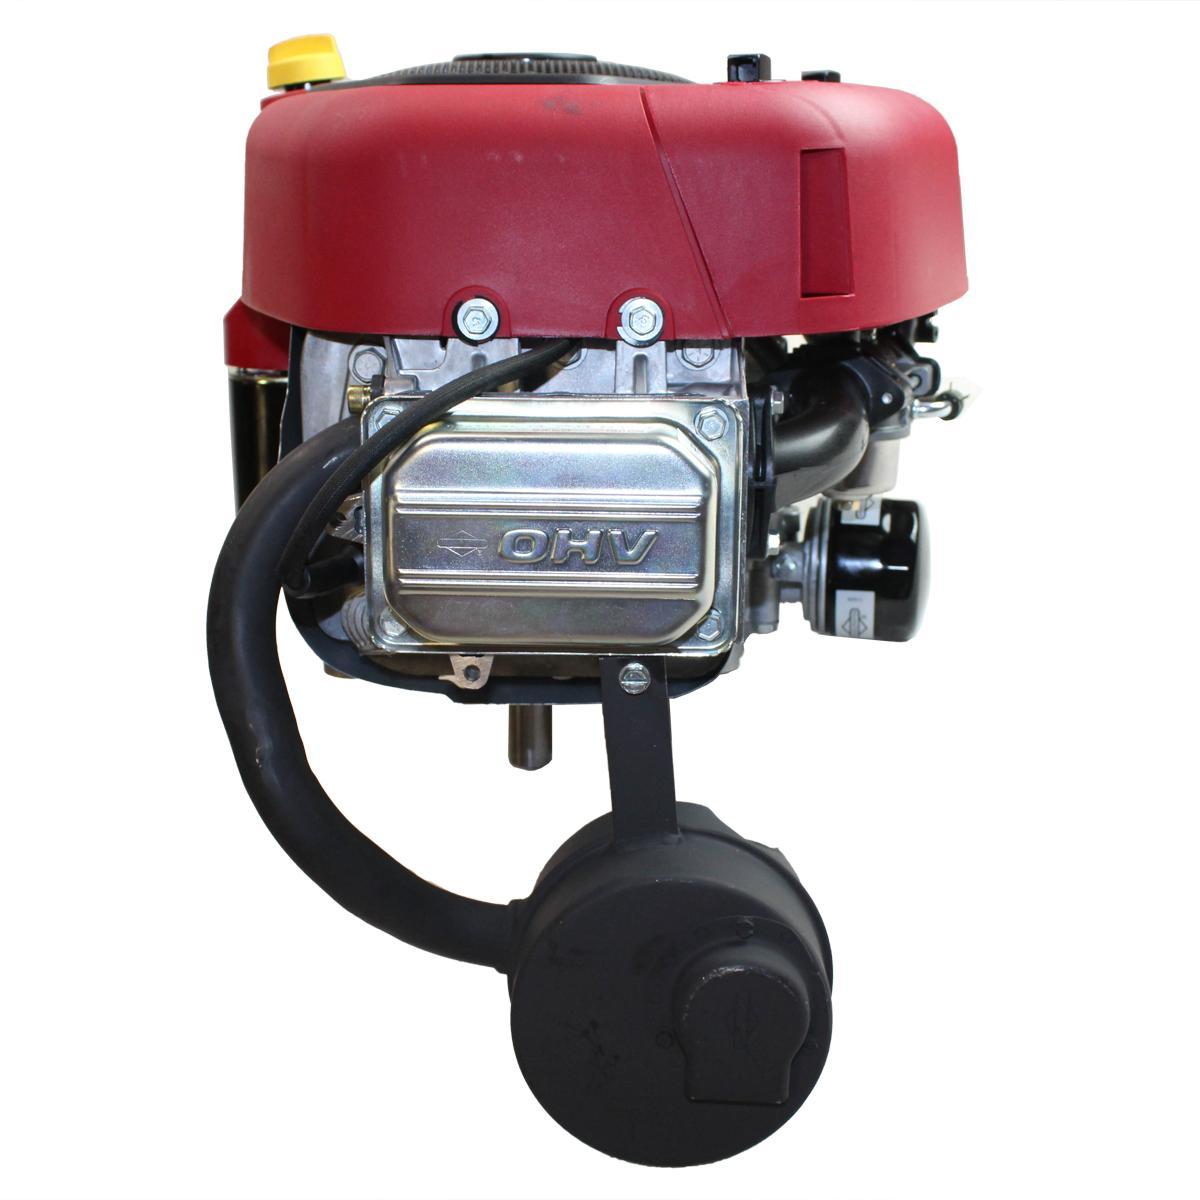 31r977 Jd Lt155 R1 Briggs Amp Stratton Gas Engines Vertical